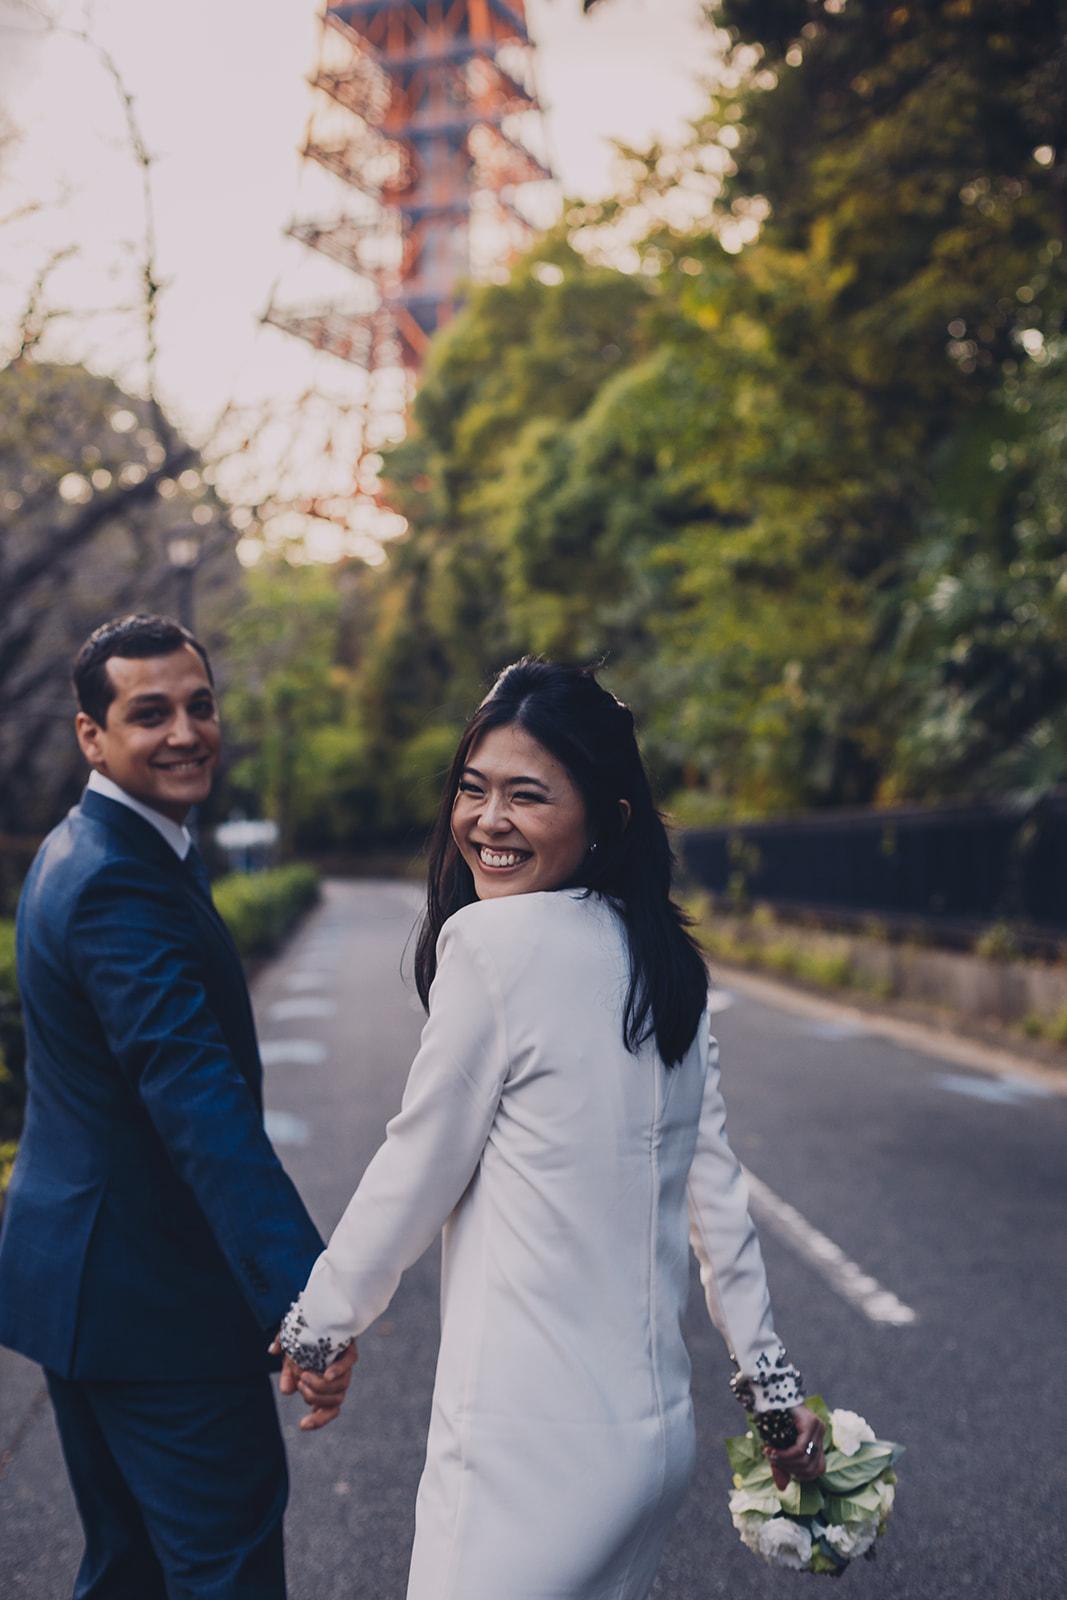 Prewedding pre wedding engagement in Tokyo Japan hire photographer (11).jpg